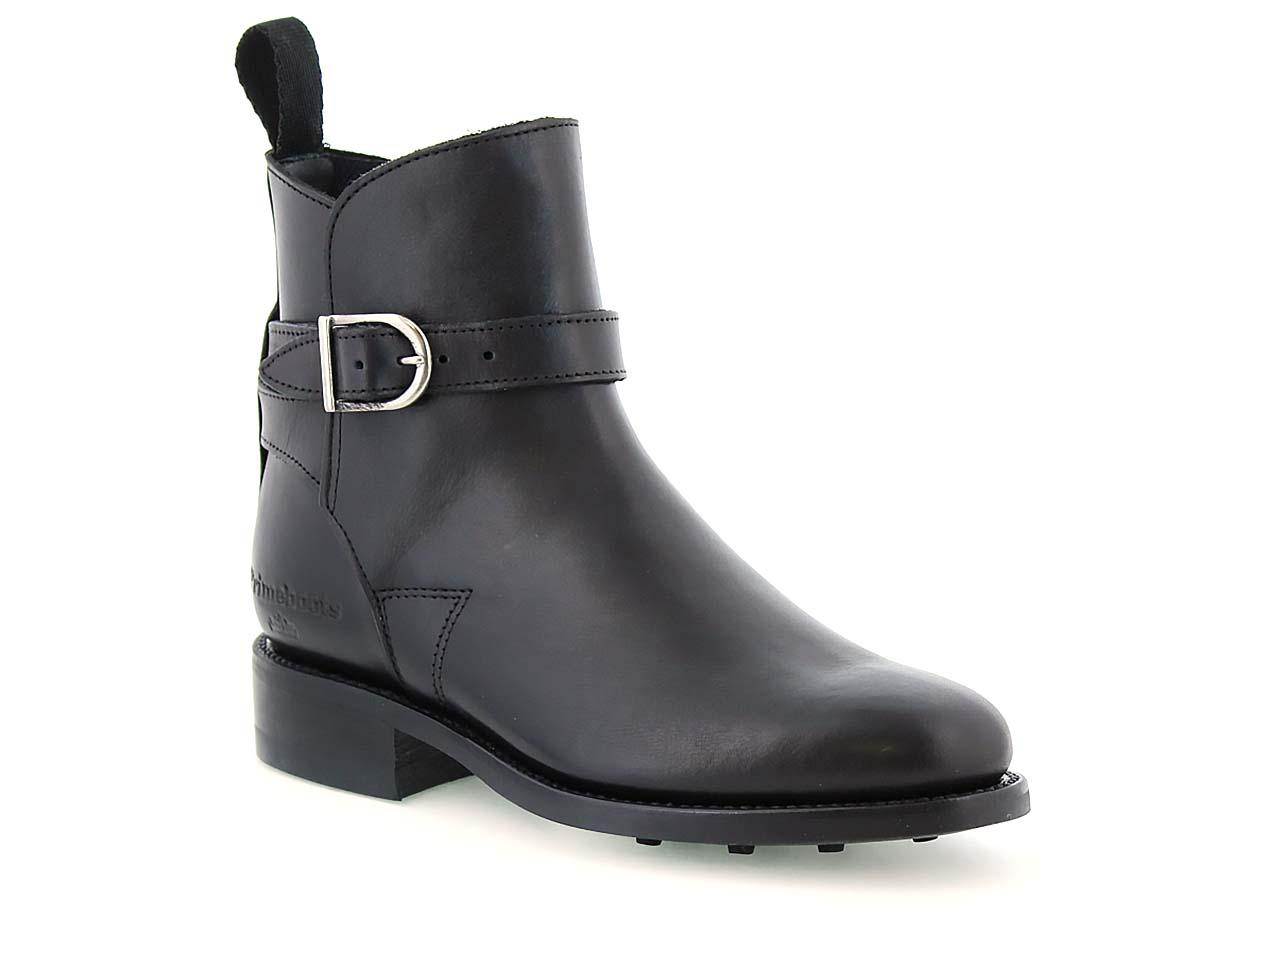 PrimeBoots skor online   FOOTWAY   Boots, Chelsea boots, Shoes